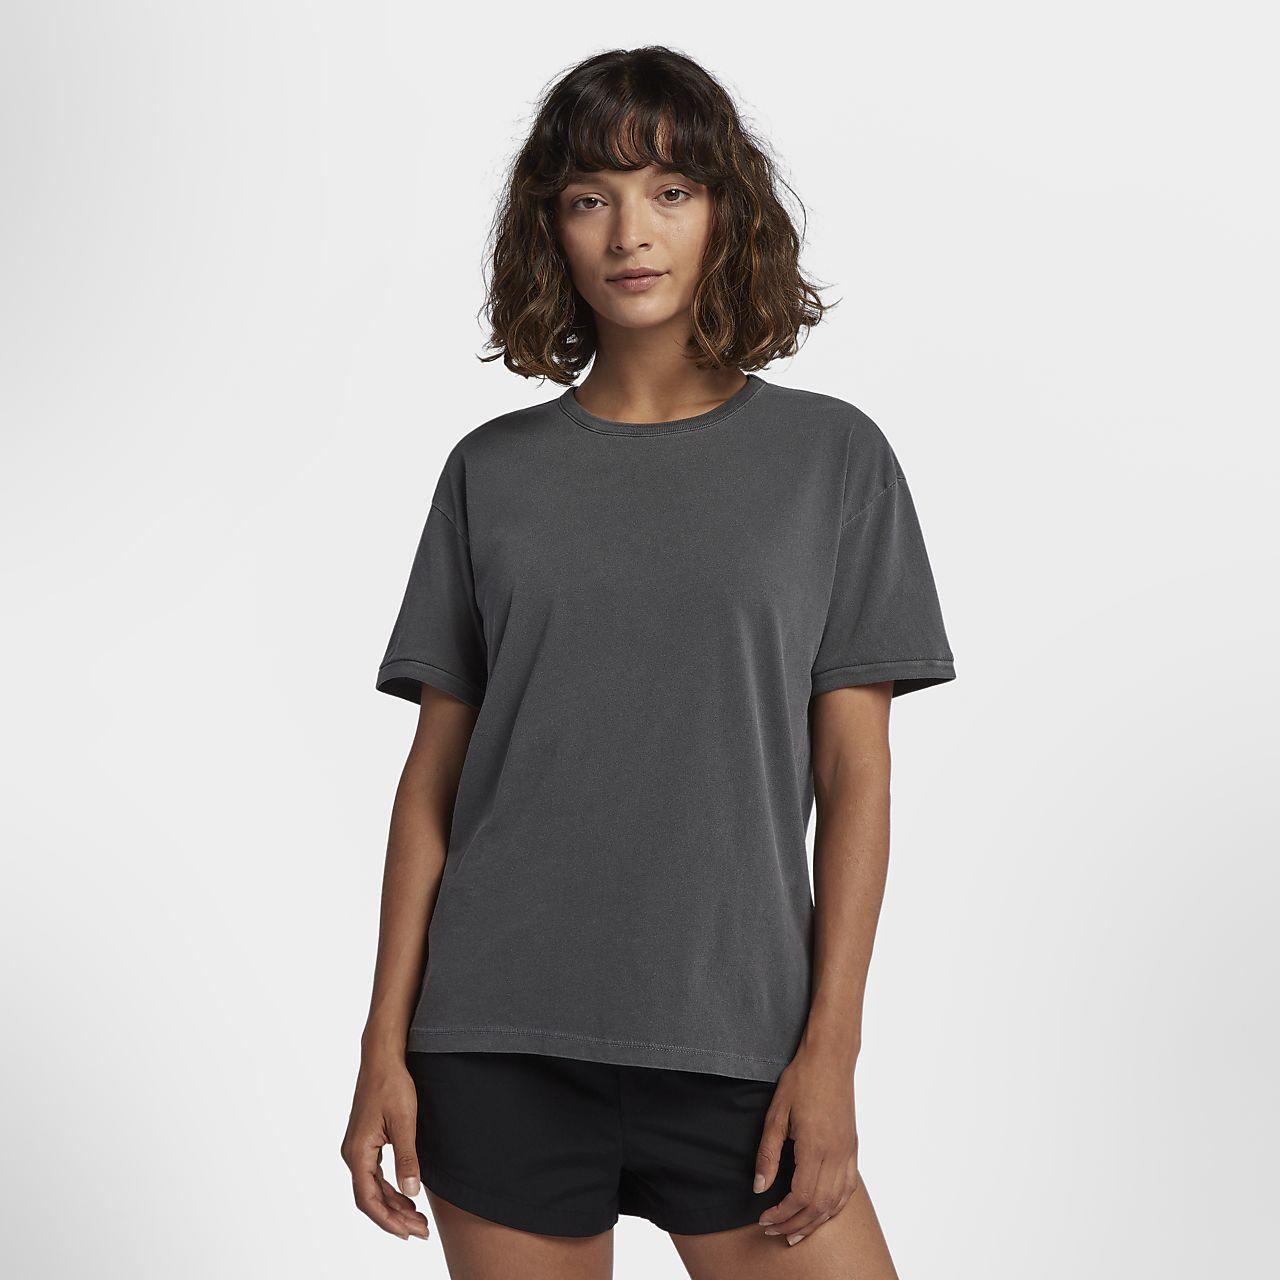 306153d7a13 Hurley Solid Wash Ringer Women s T-Shirt. Nike.com